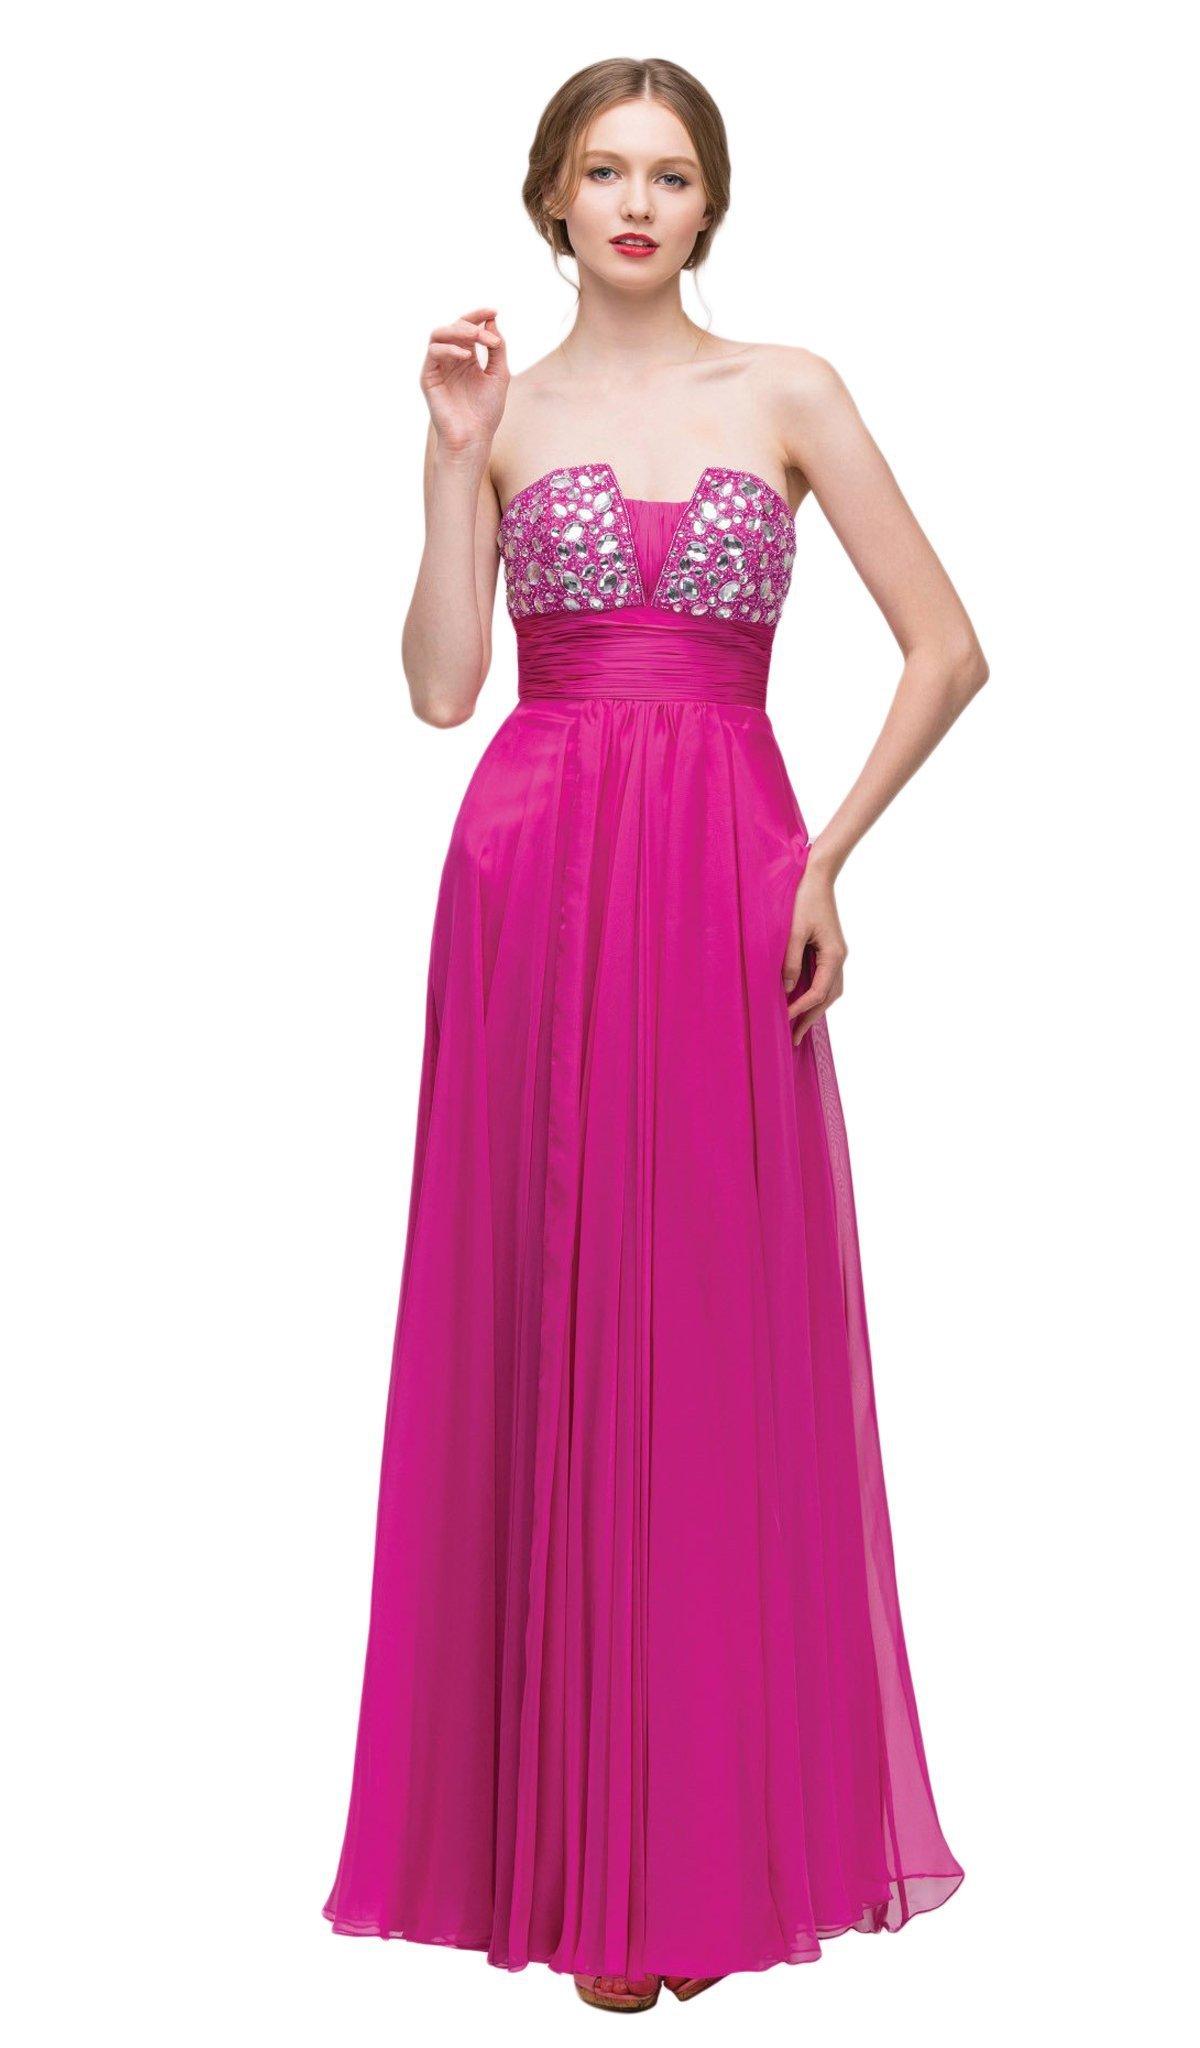 Eureka Fashion - 2414 Strapless Beaded Pleated Chiffon A-line Dress